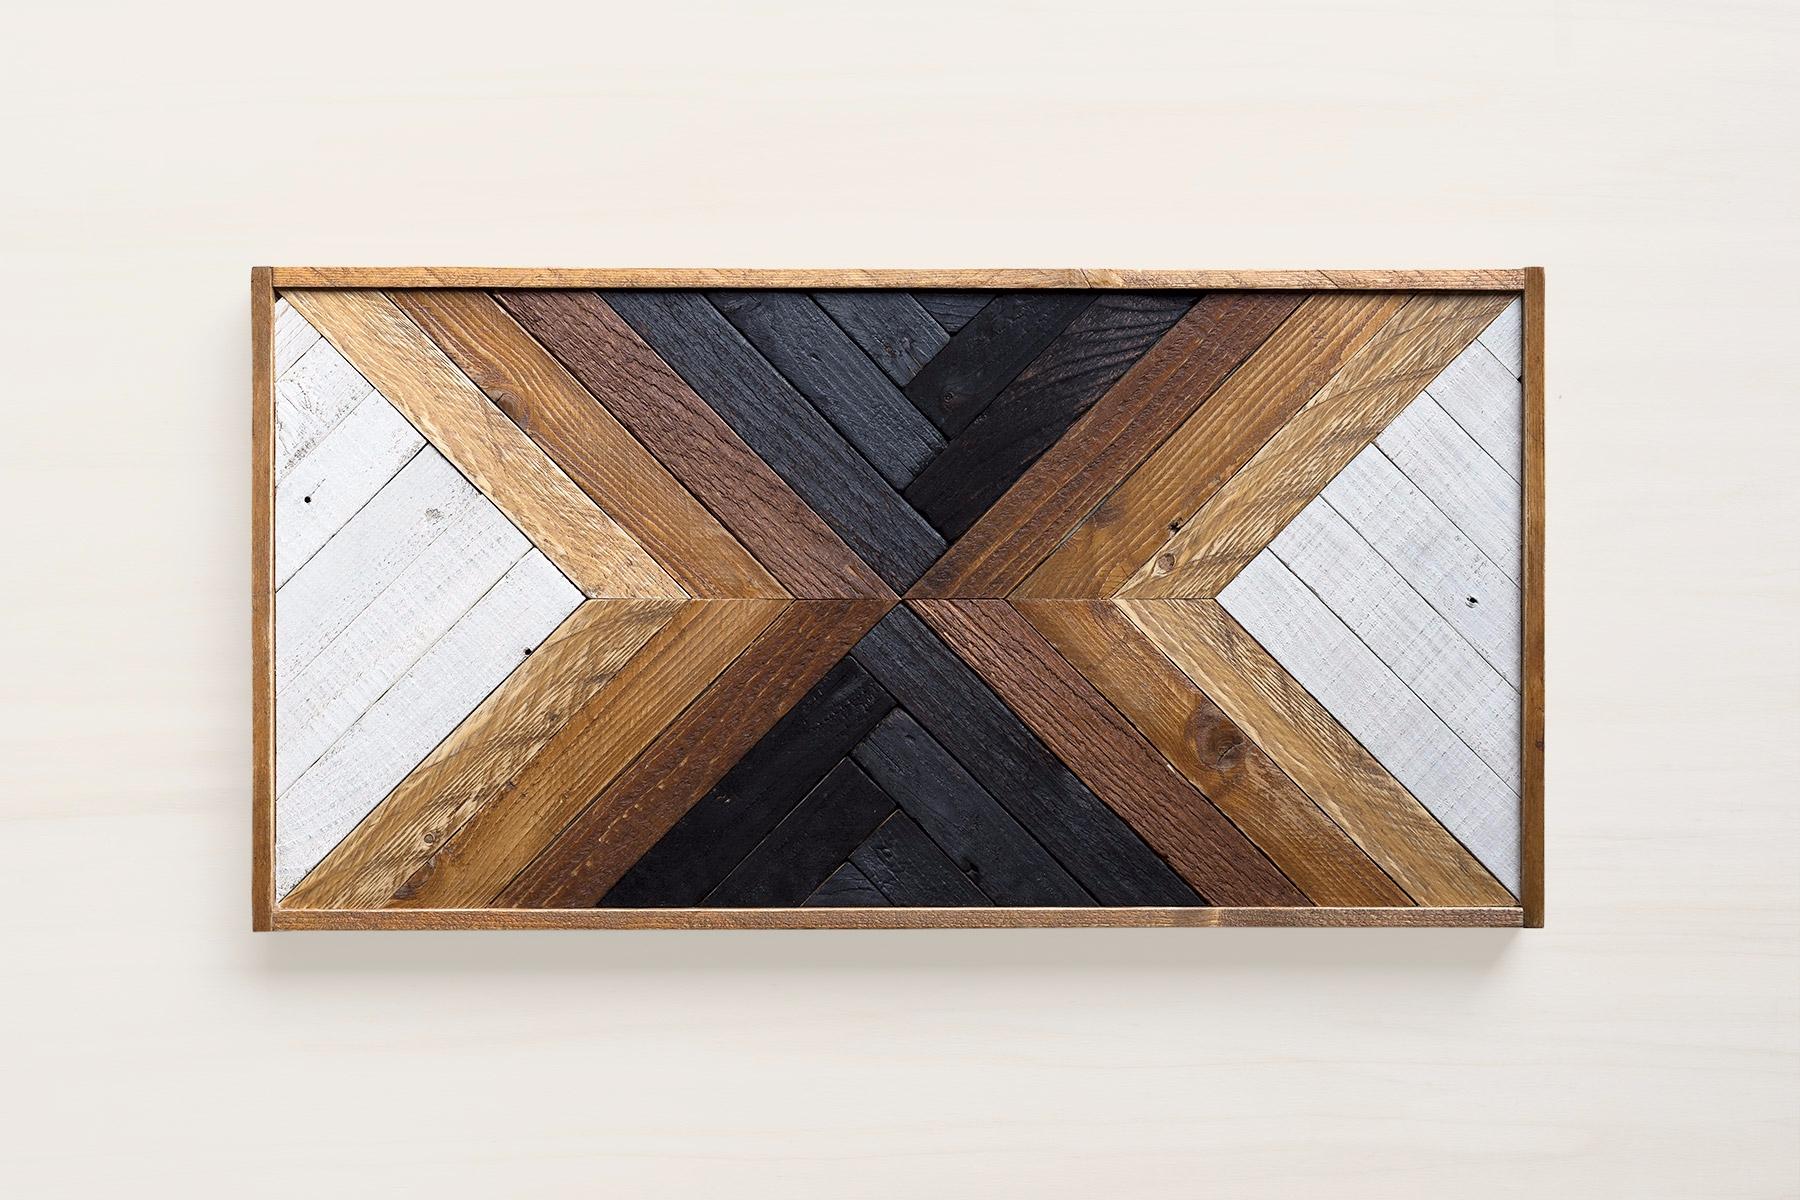 Maka | reclaimed wood wall art  - despalettos | ello